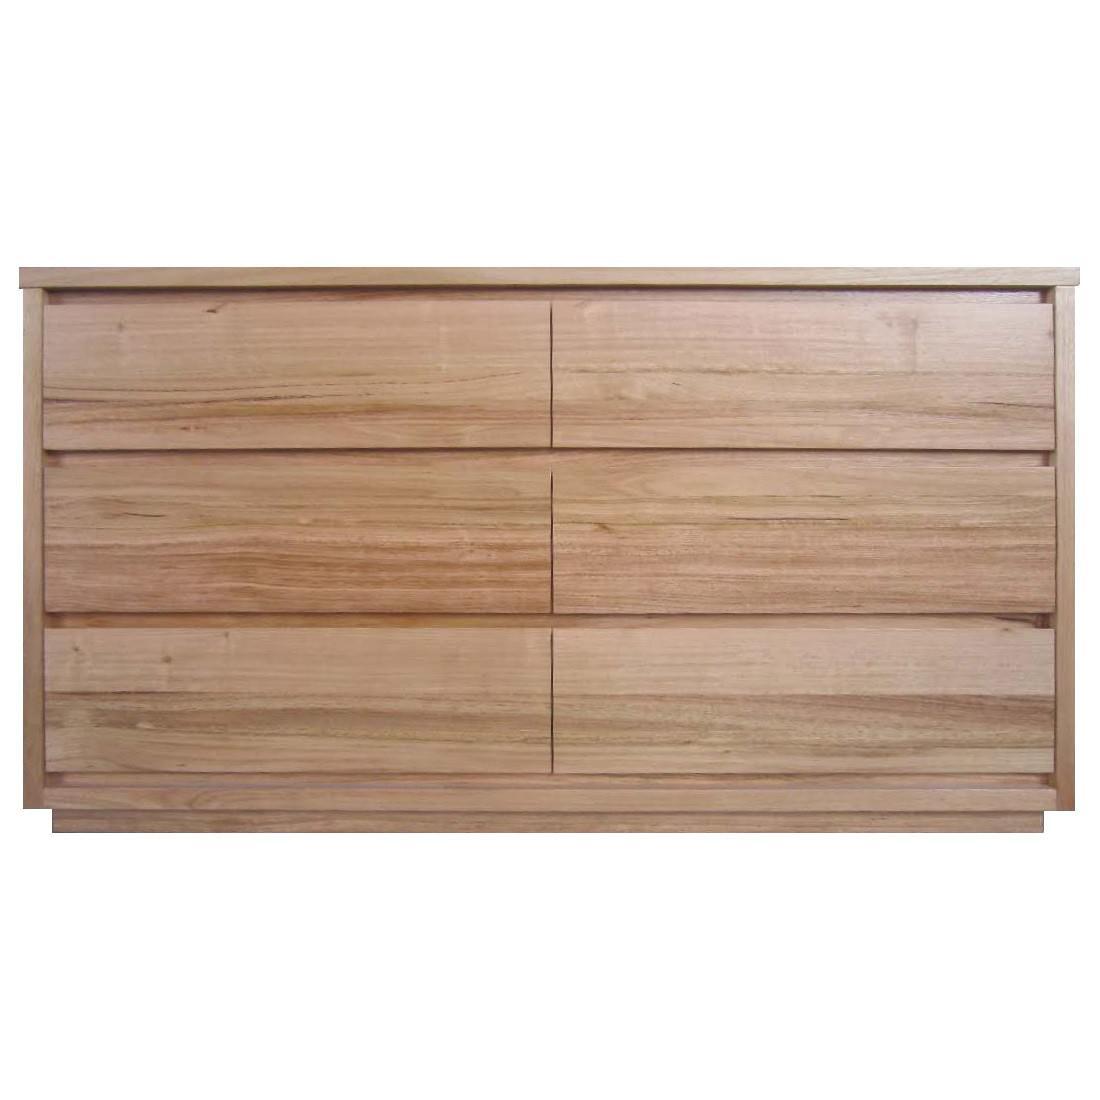 Padstow Messmate Timber 6 Drawer Dresser